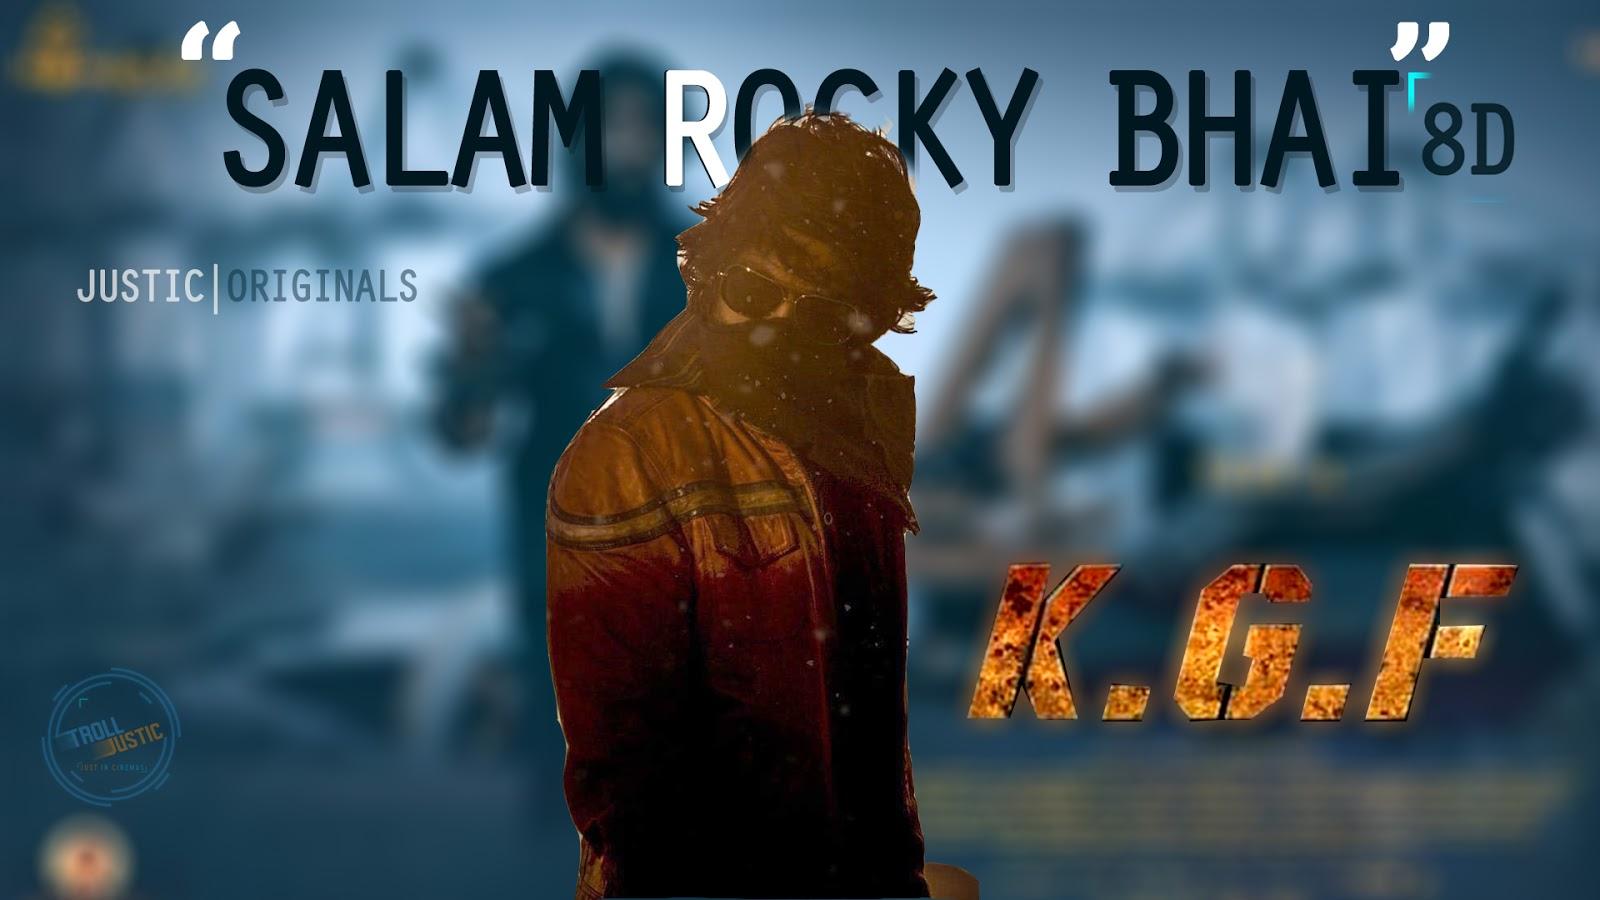 8D Aud Salaam Rocky Bhai Song — Pixlcorps